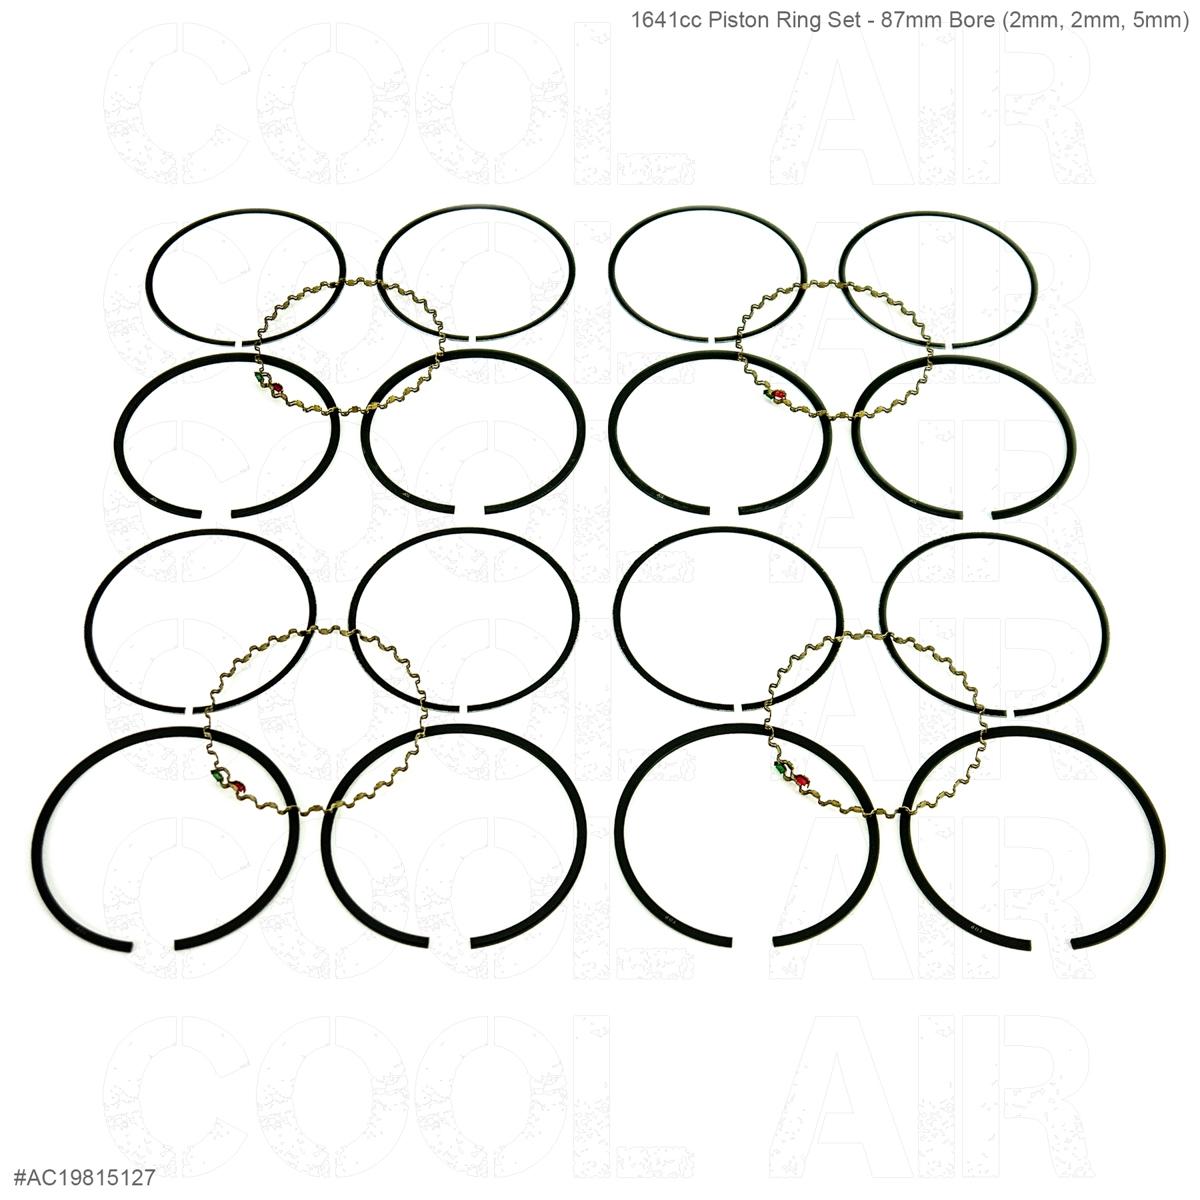 1641cc Piston Ring Set - 87mm Bore (2mm, 2mm, 5mm)